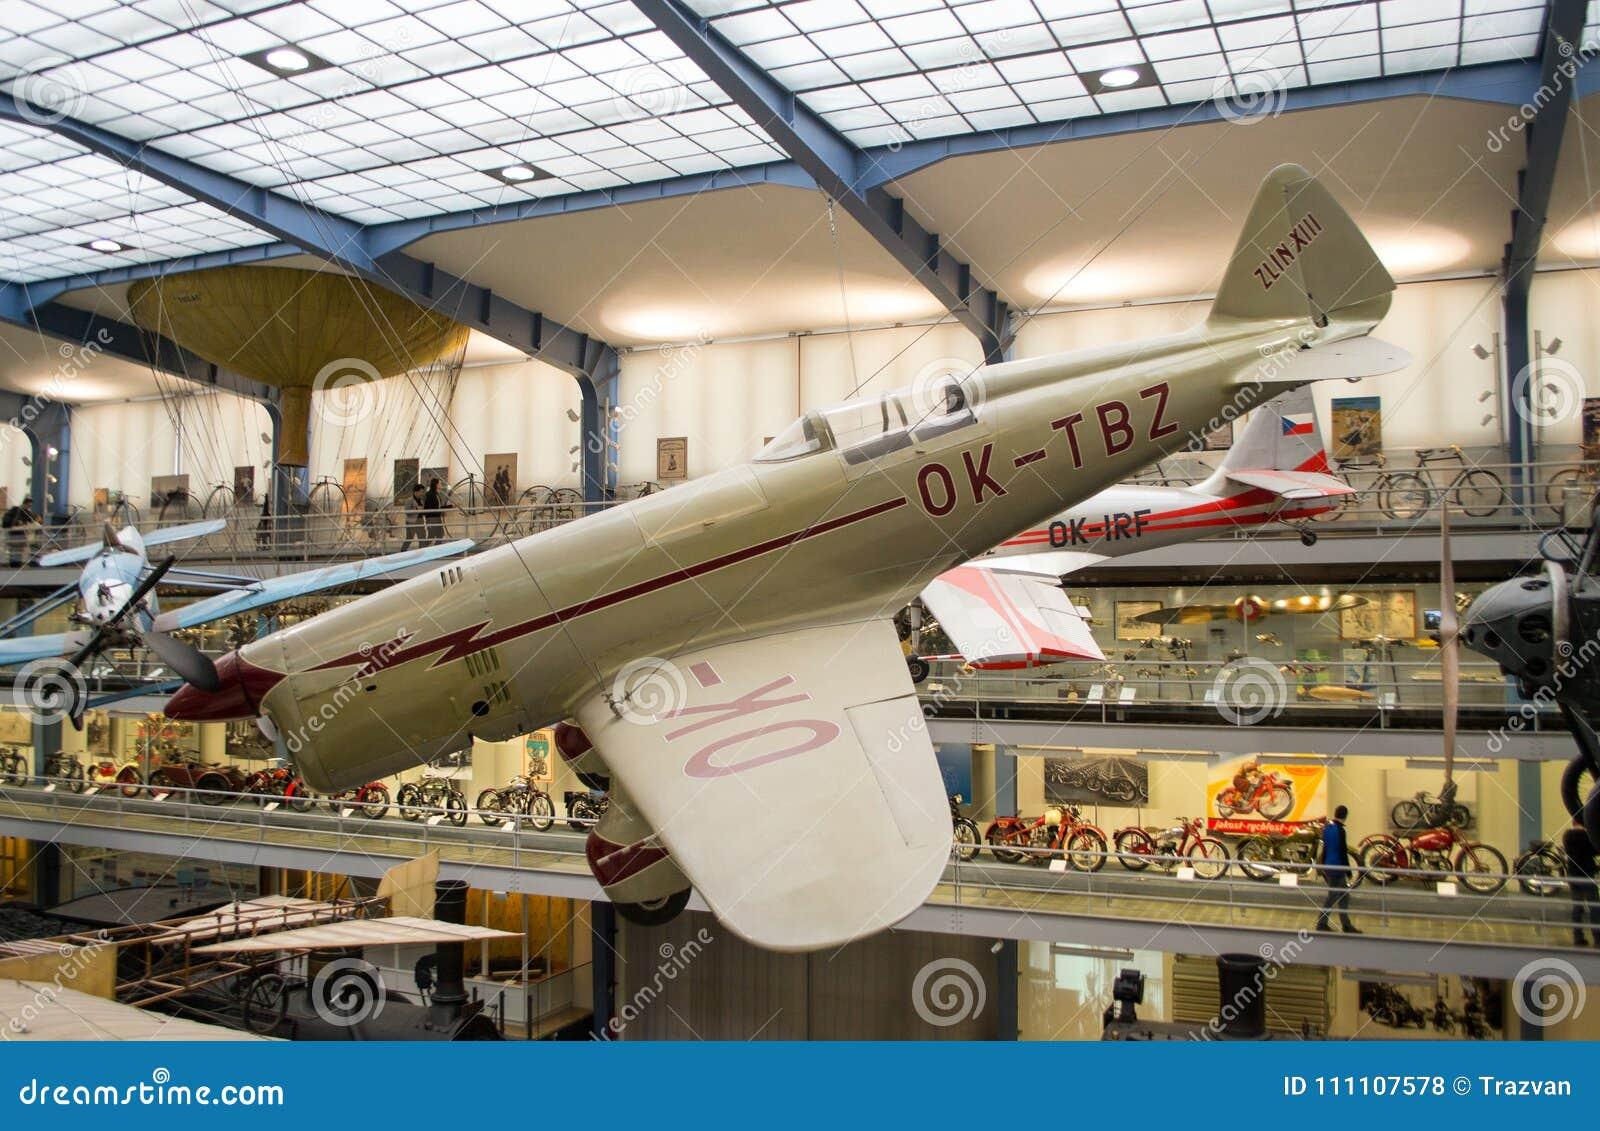 Zlin XIII, registrering OK-TBZ, nationellt tekniskt museum, Prague, Tjeckien